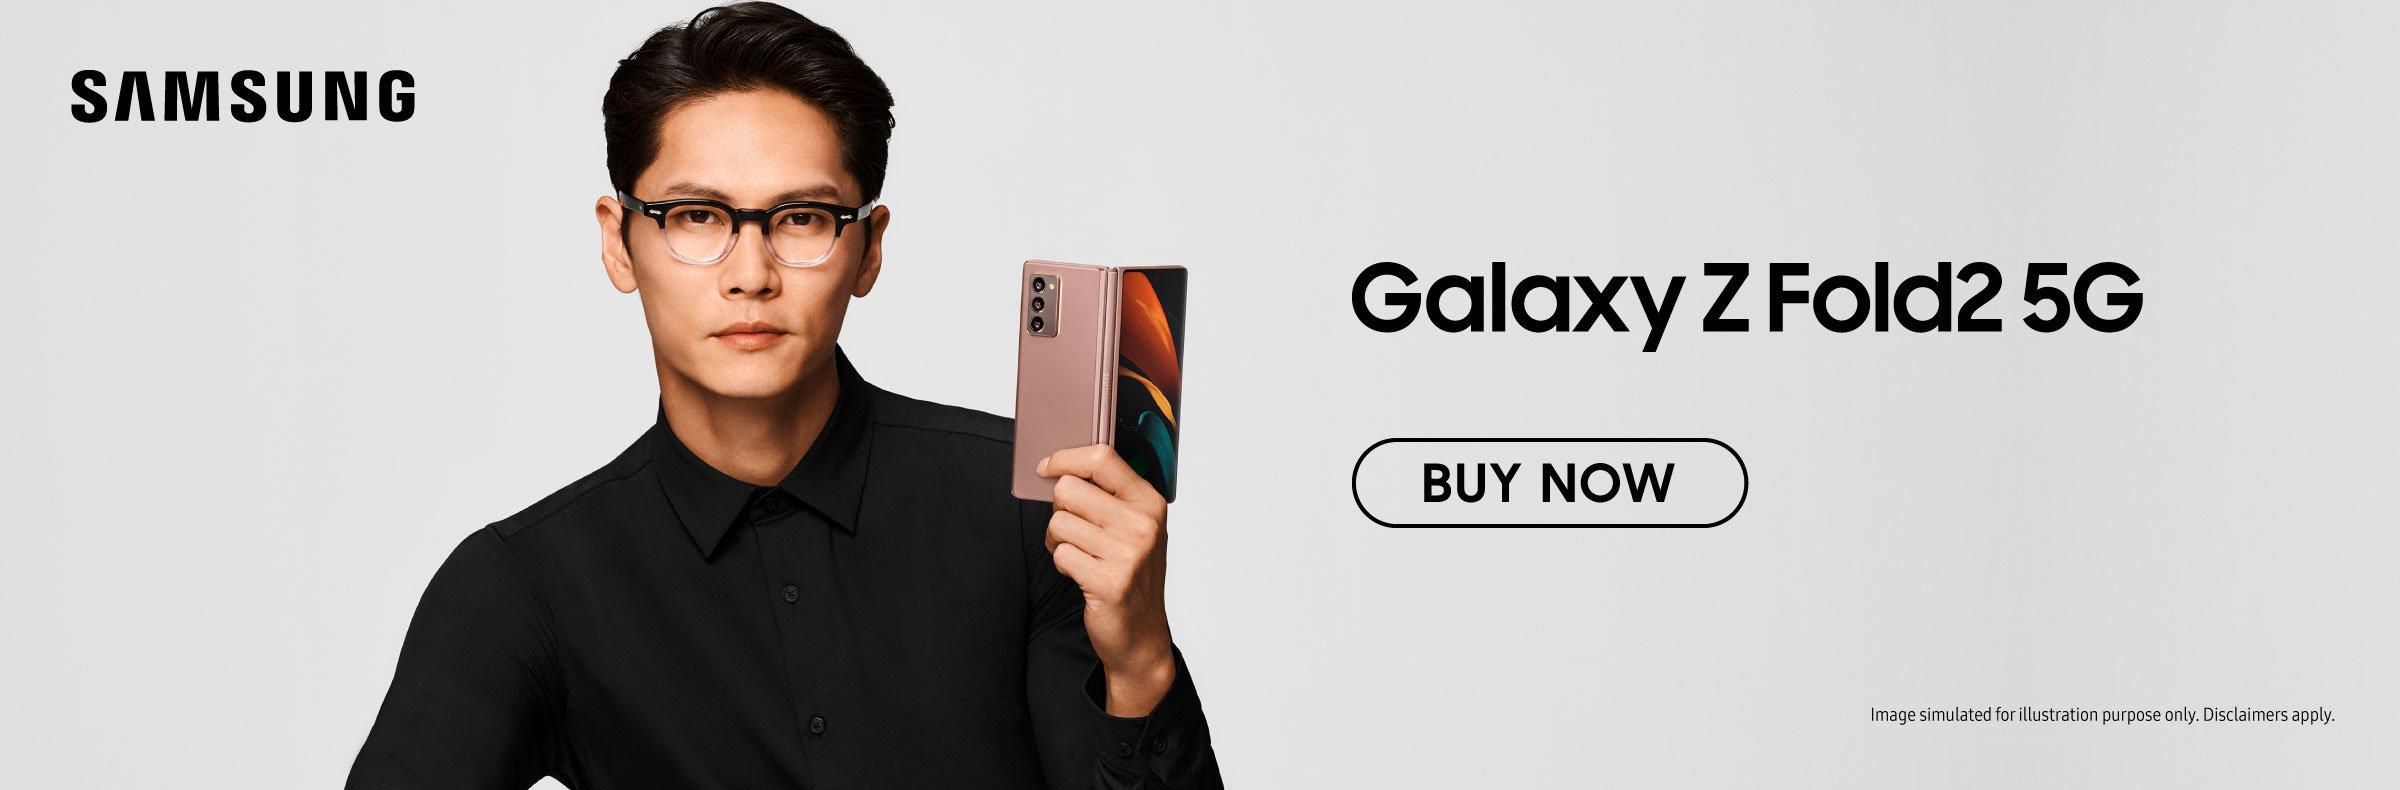 Samsung Z Fold2 5G